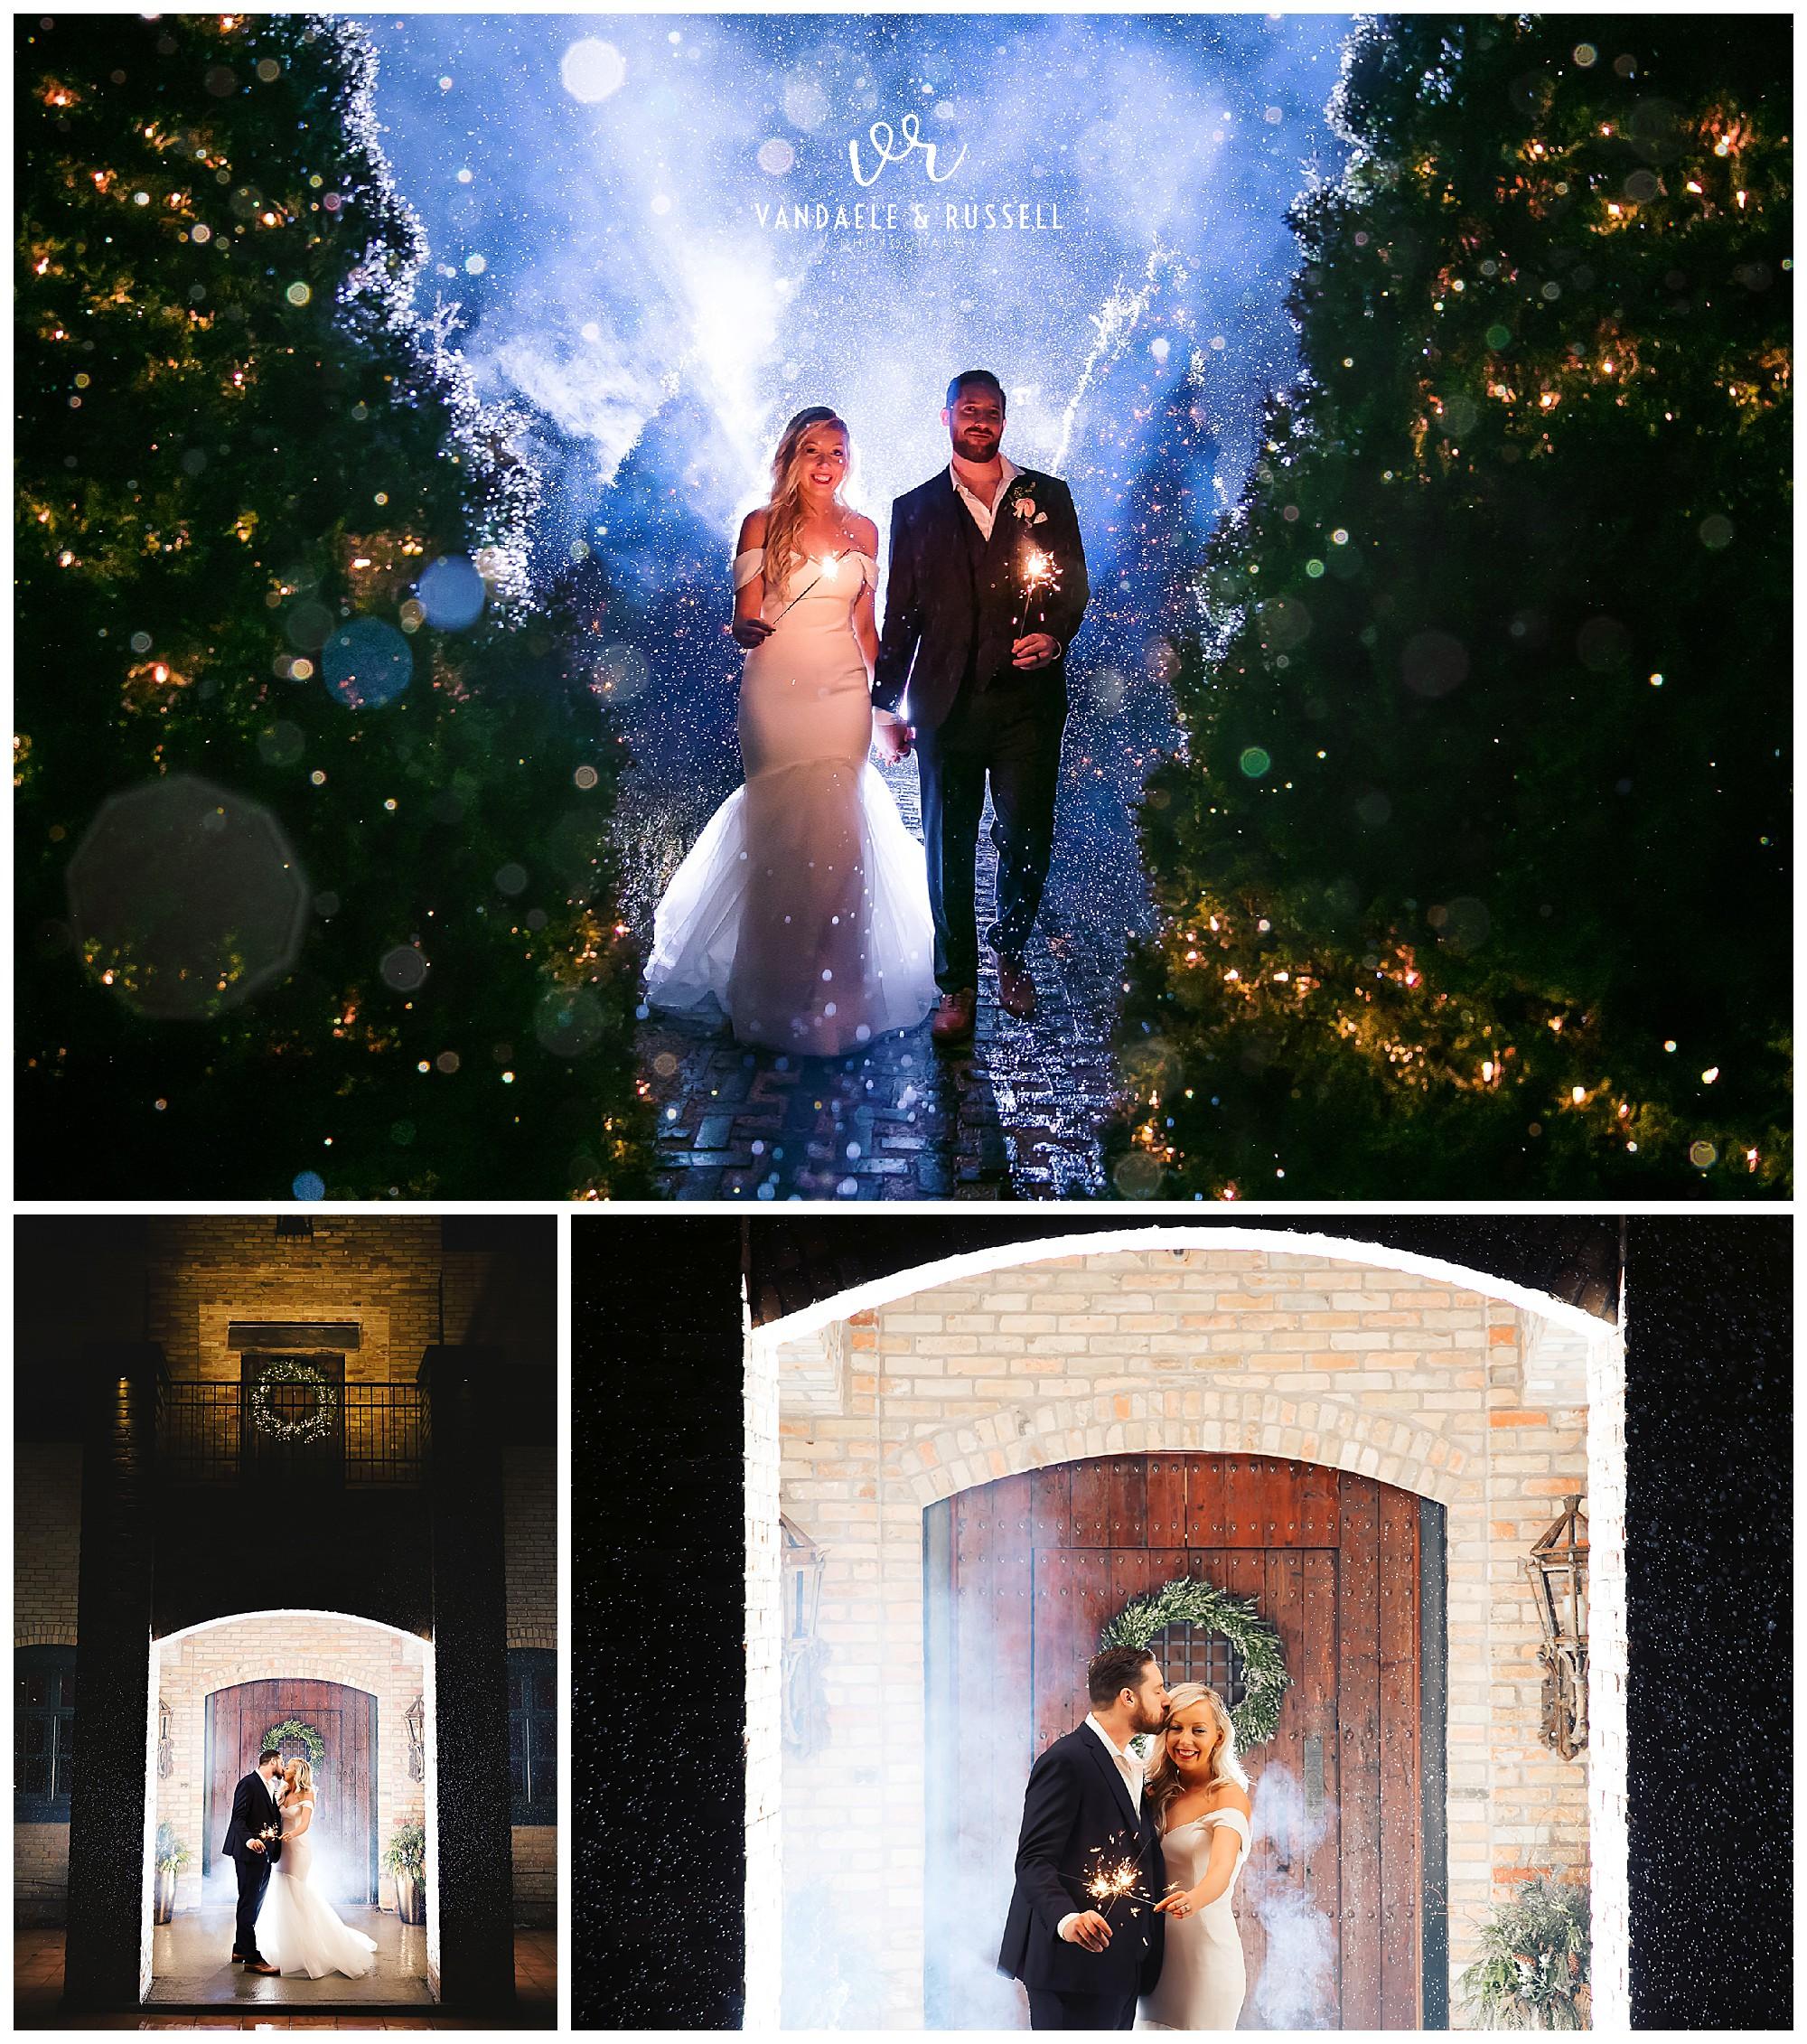 Hacienda-Sarria-Wedding-Photos-NYE-Michelle-Matt-VanDaele-Russell_0048.jpg